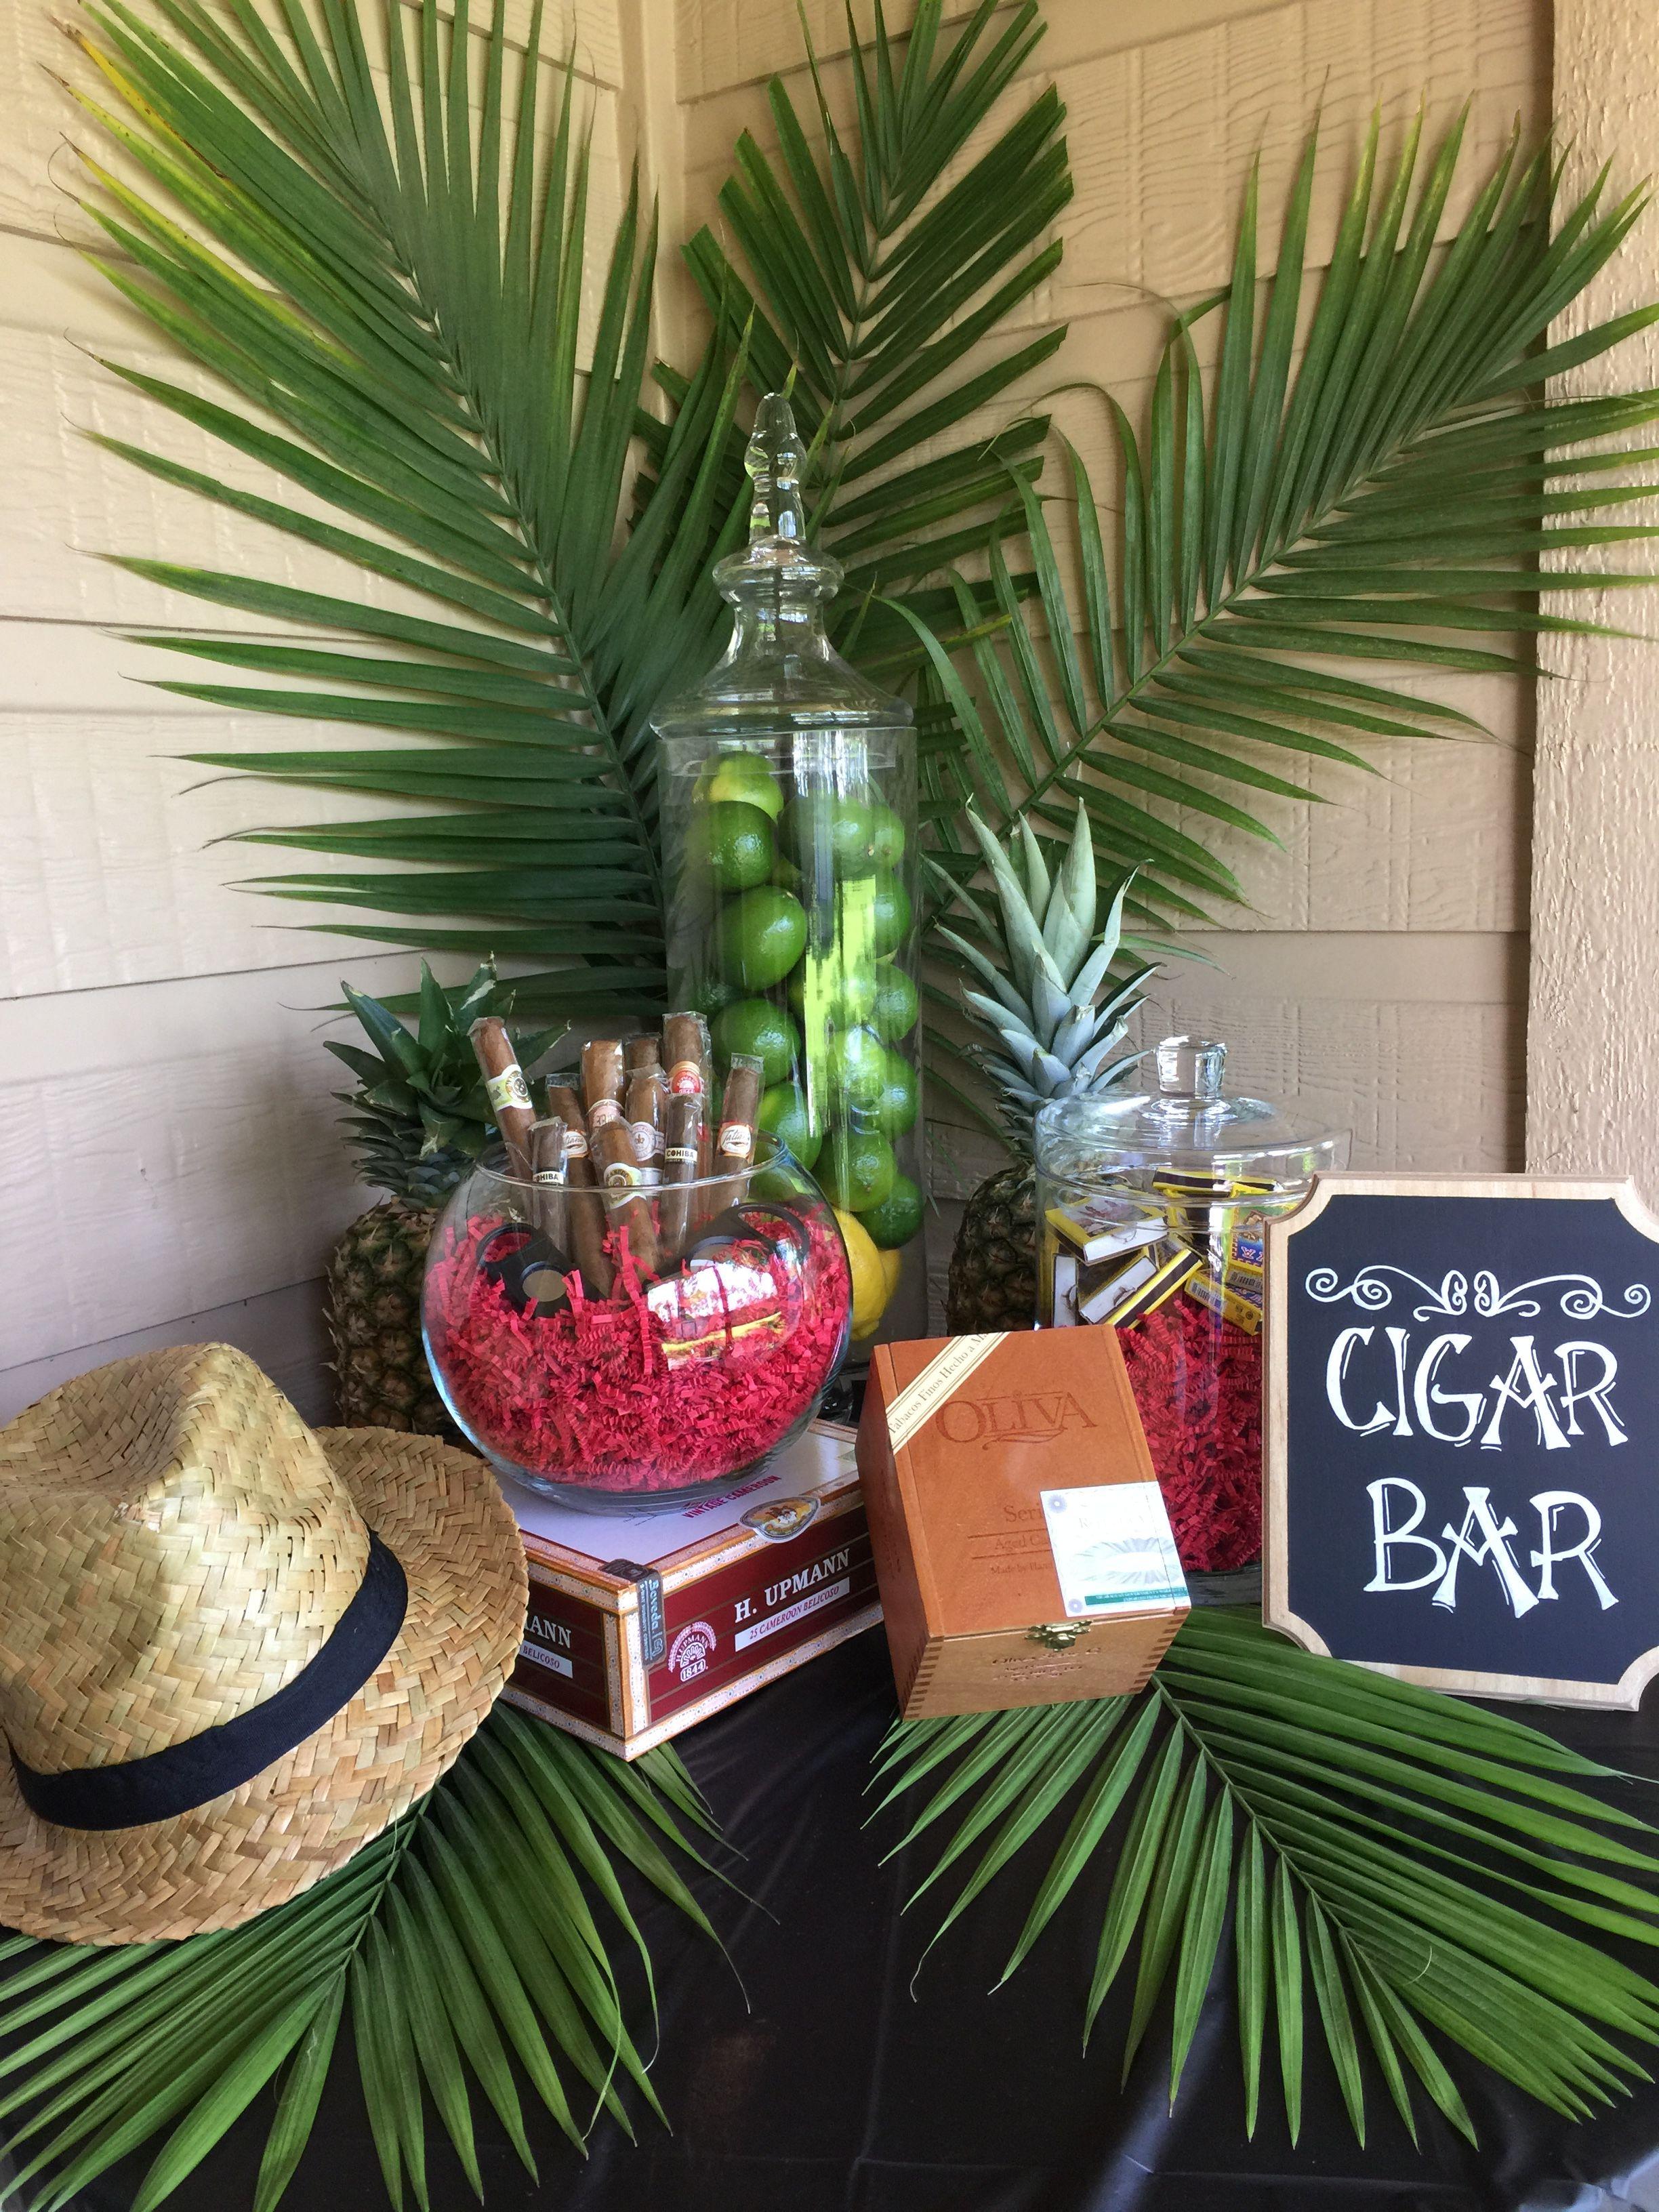 Diy Cigar Bar Havana Nights Cuban Themed Birthday Party Assorted